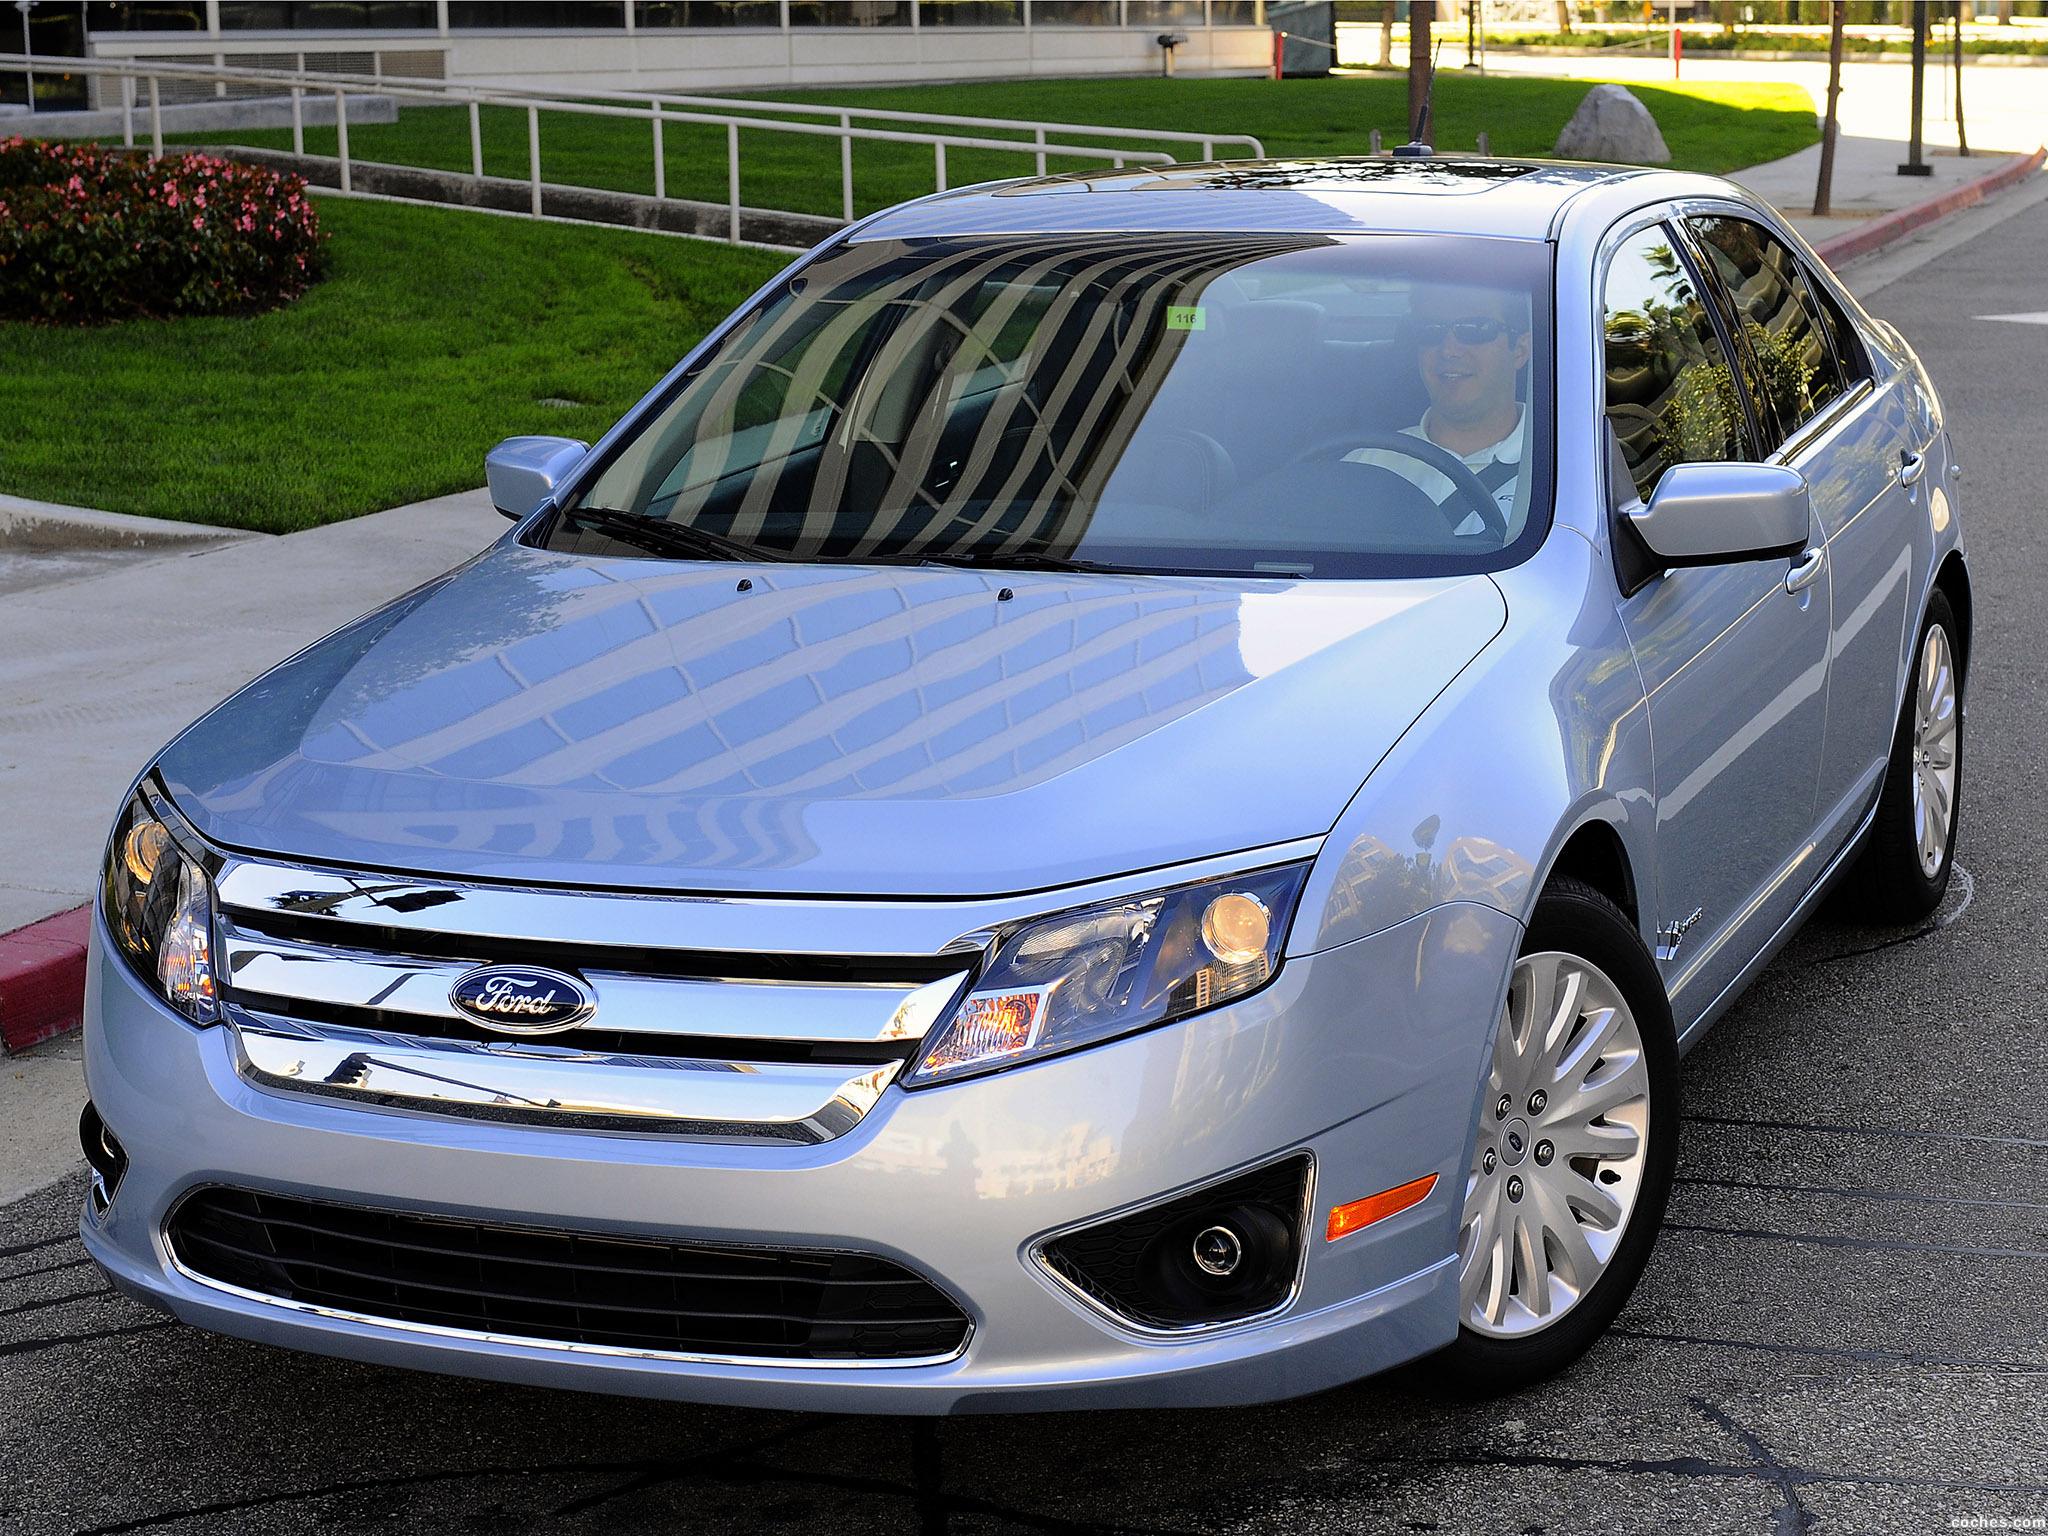 Foto 0 de Ford Fusion Hybrid USA 2009